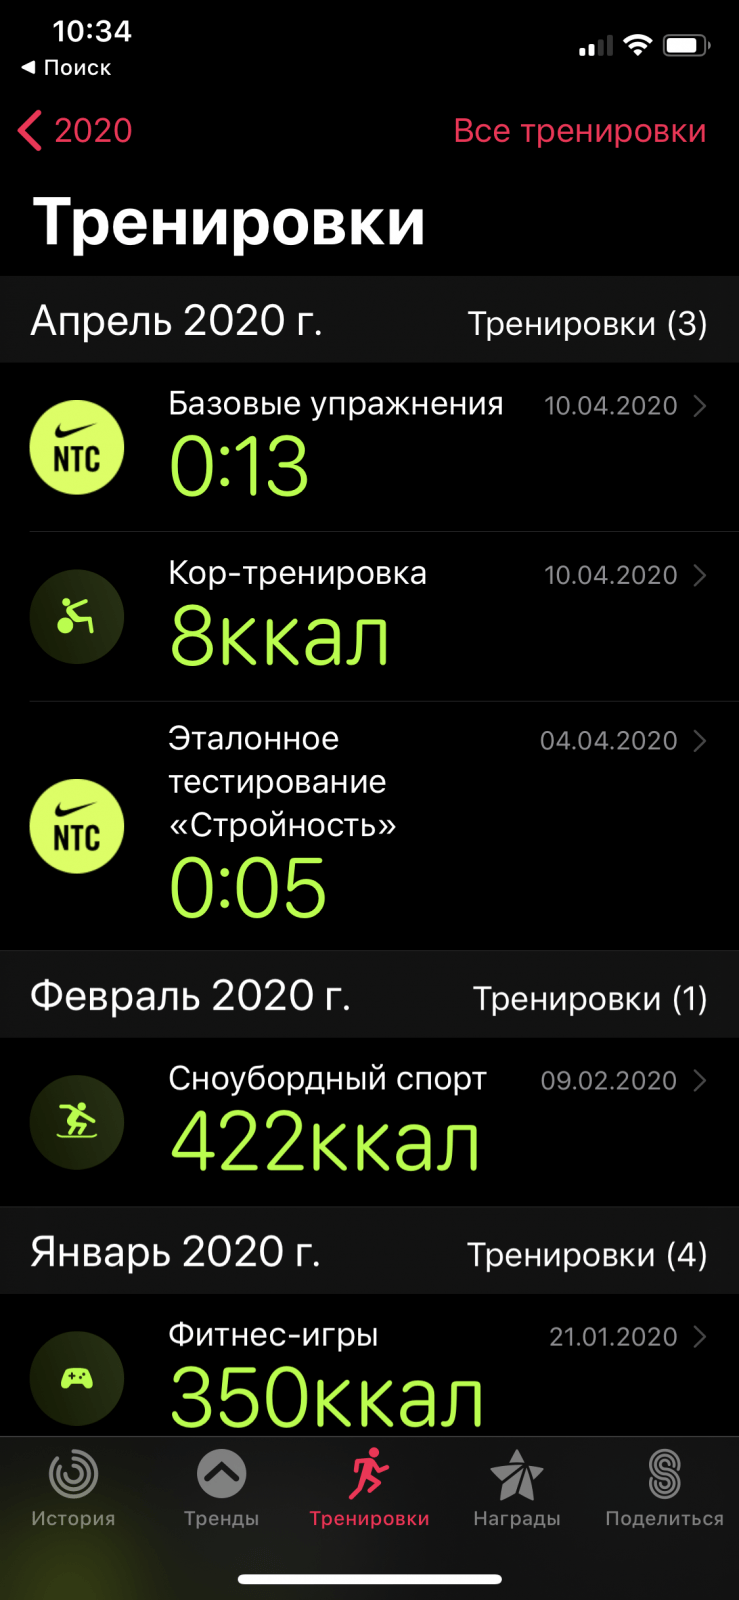 img_3054